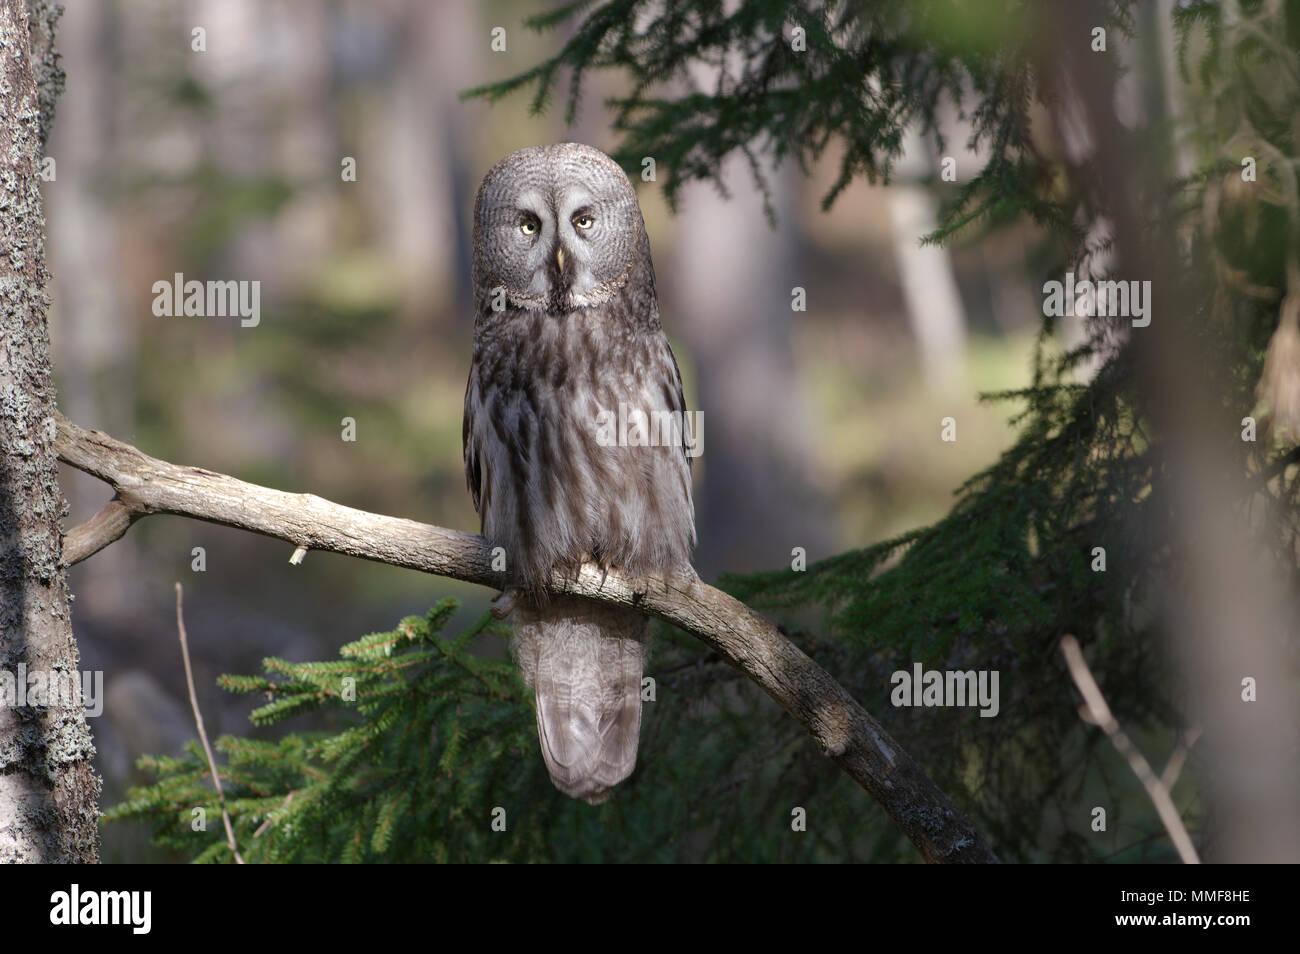 Great grey owl, Strix Nebulosa, Estonia 2018 - Stock Image